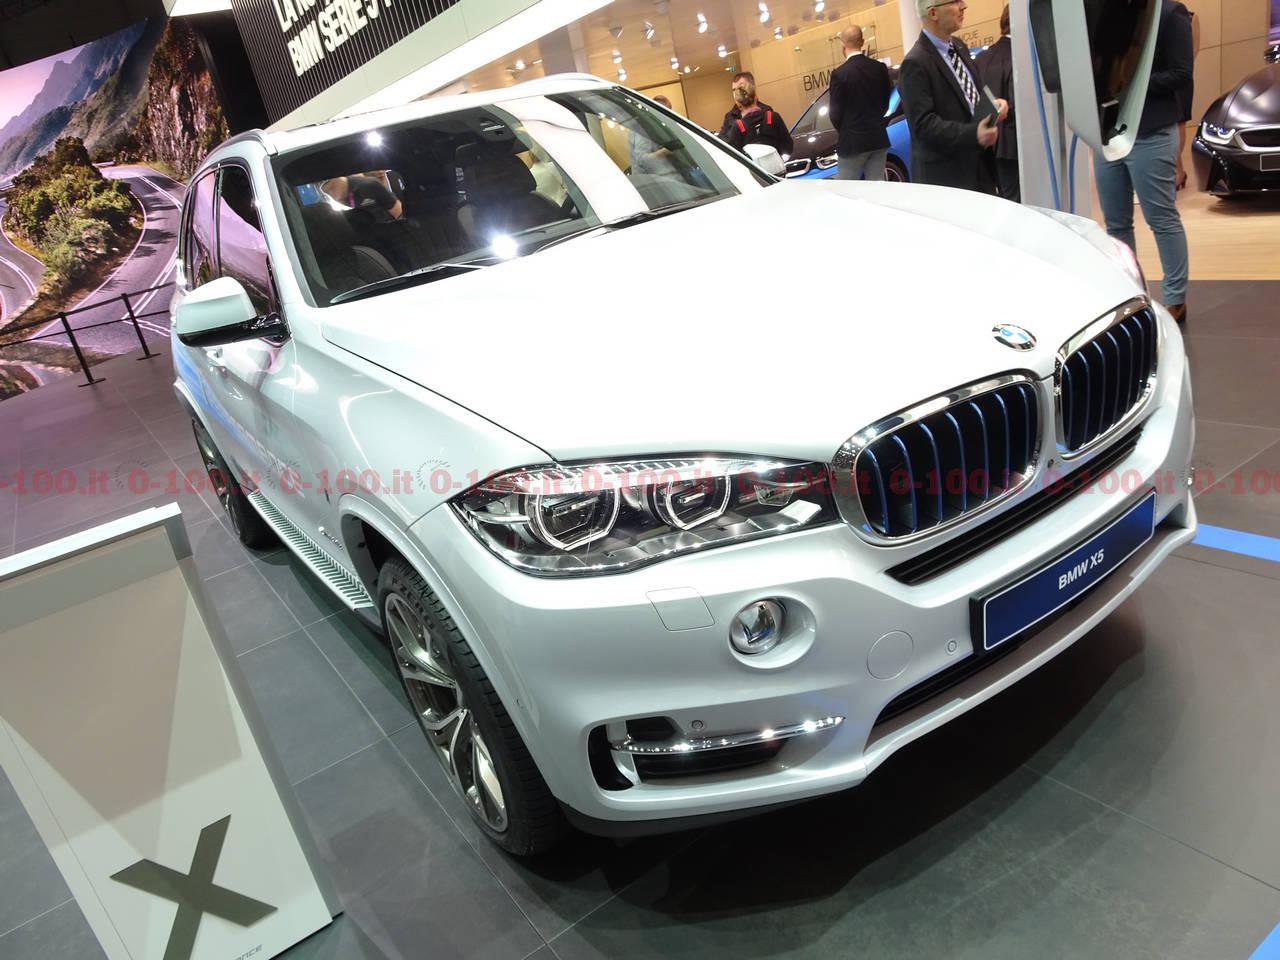 Ginevra-geneva-geneve-2017-BMW-x5-0-100_3